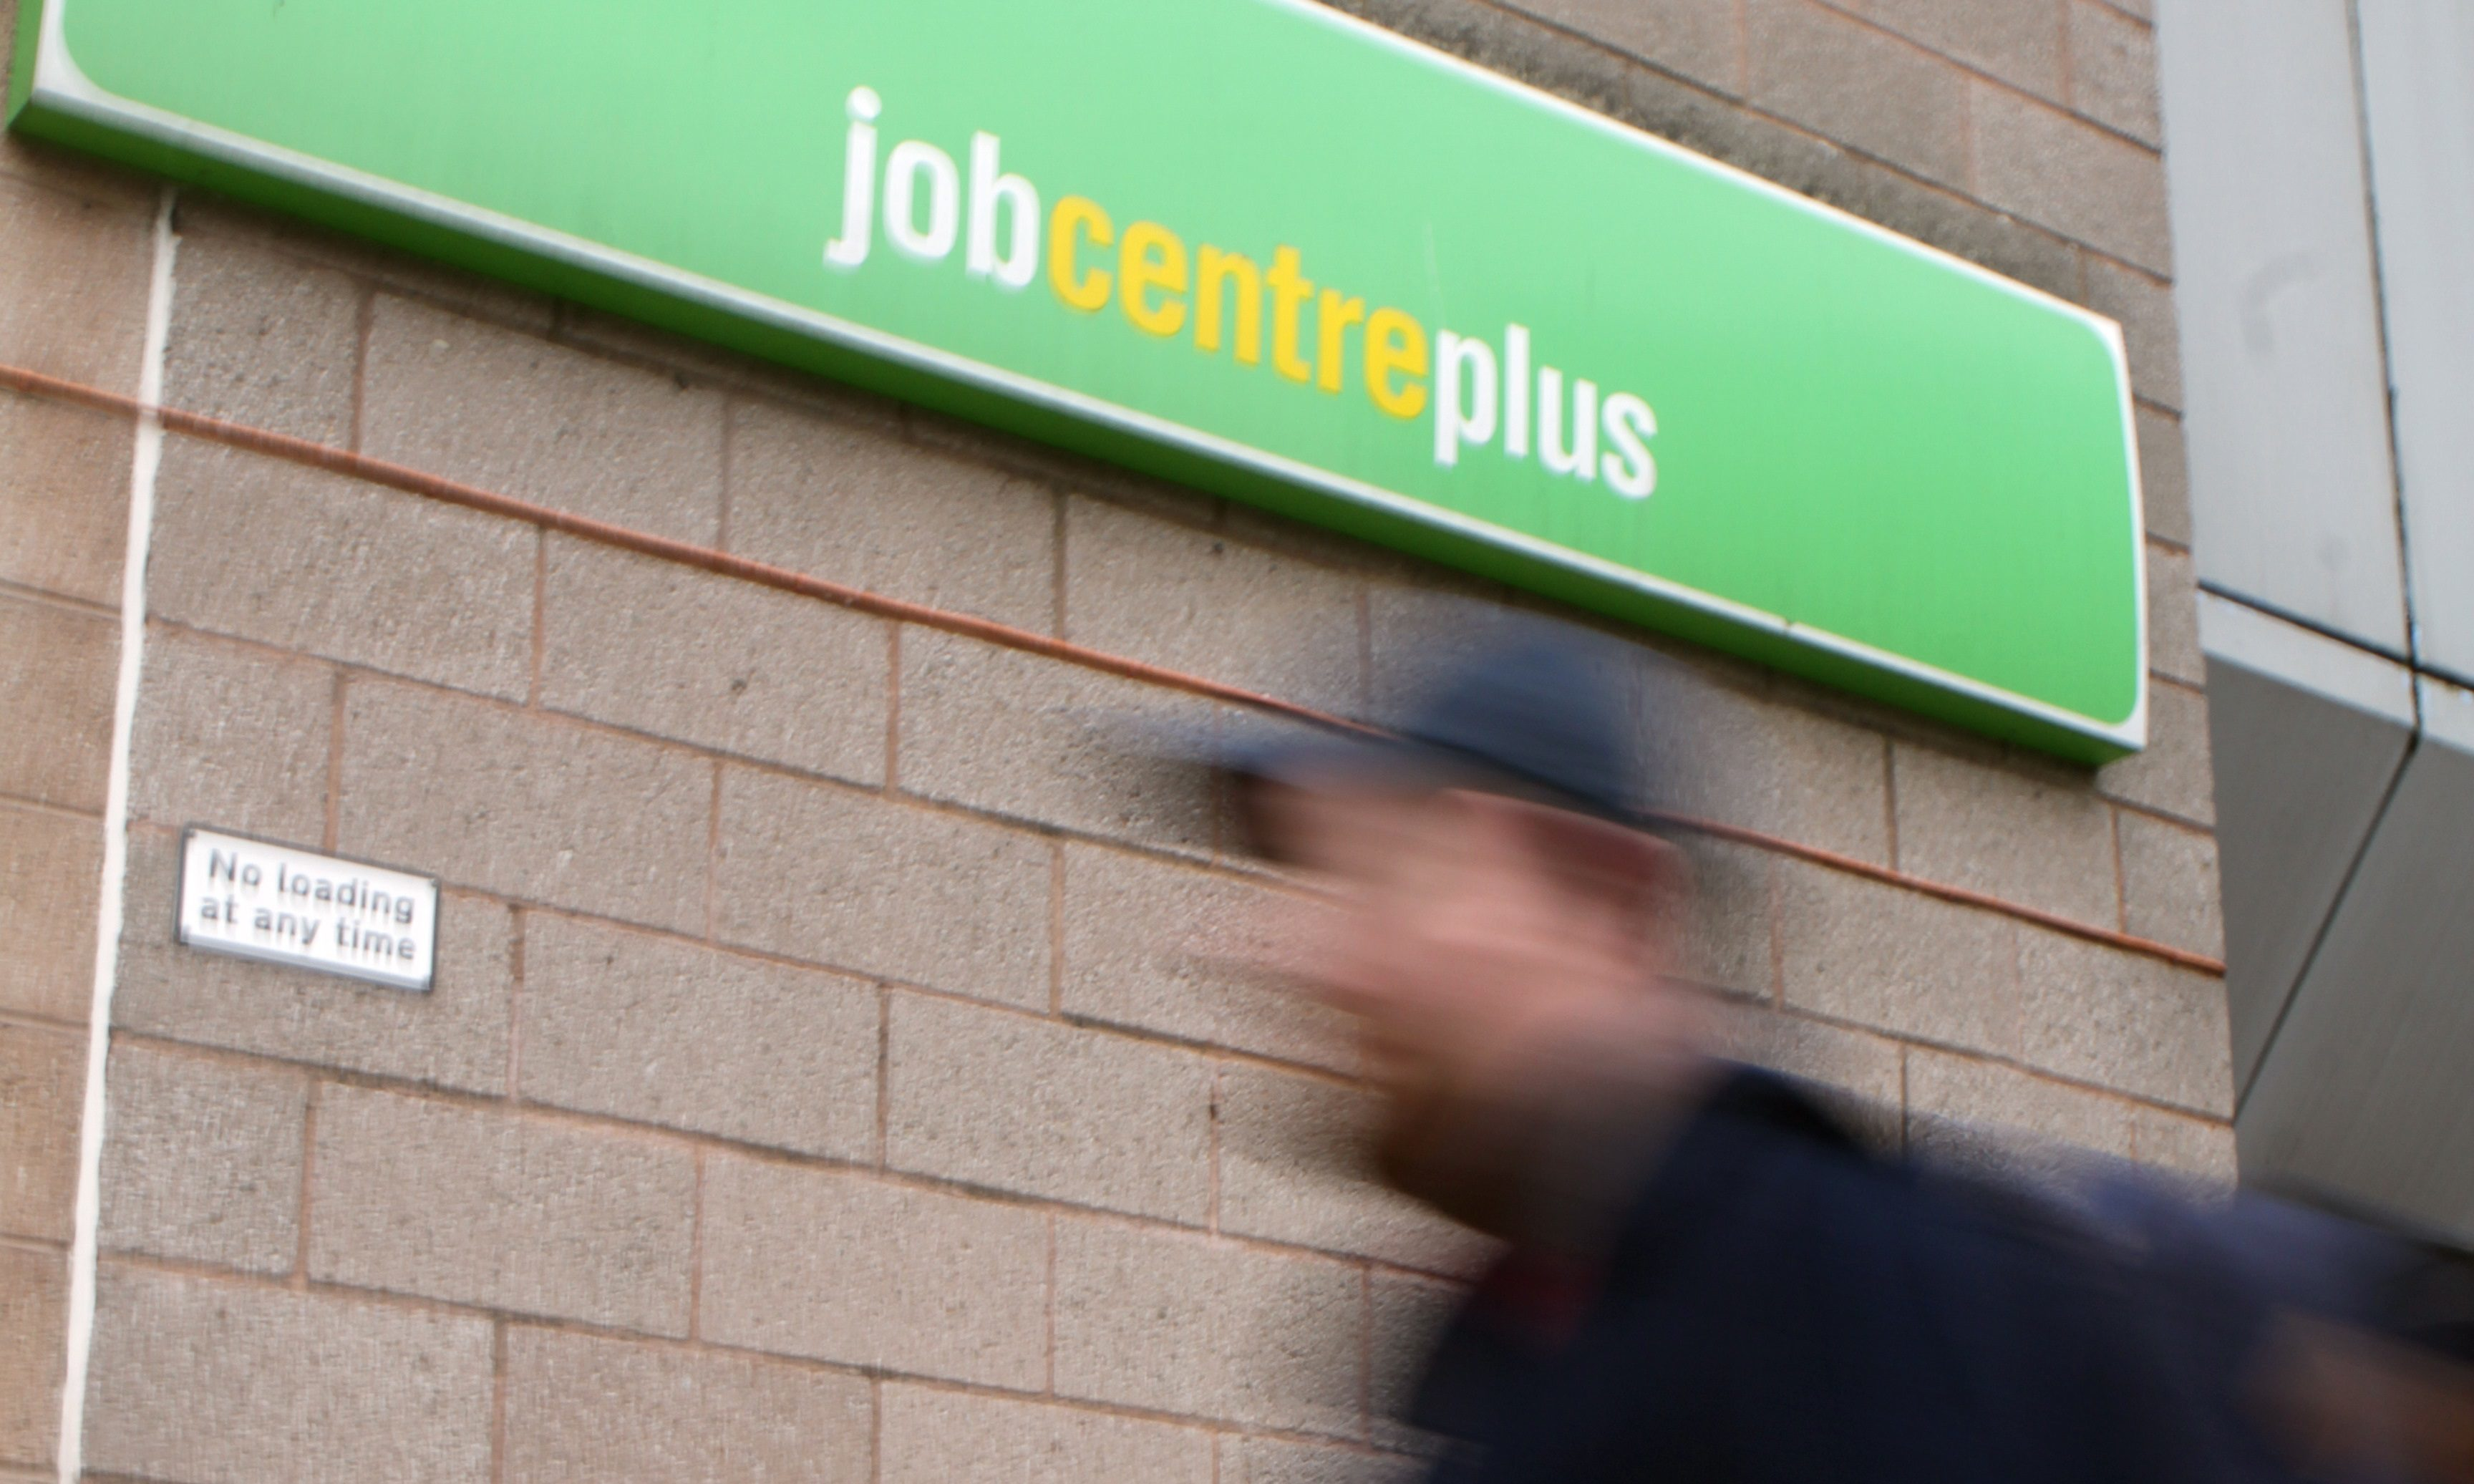 Dundee Jobcentre Plus